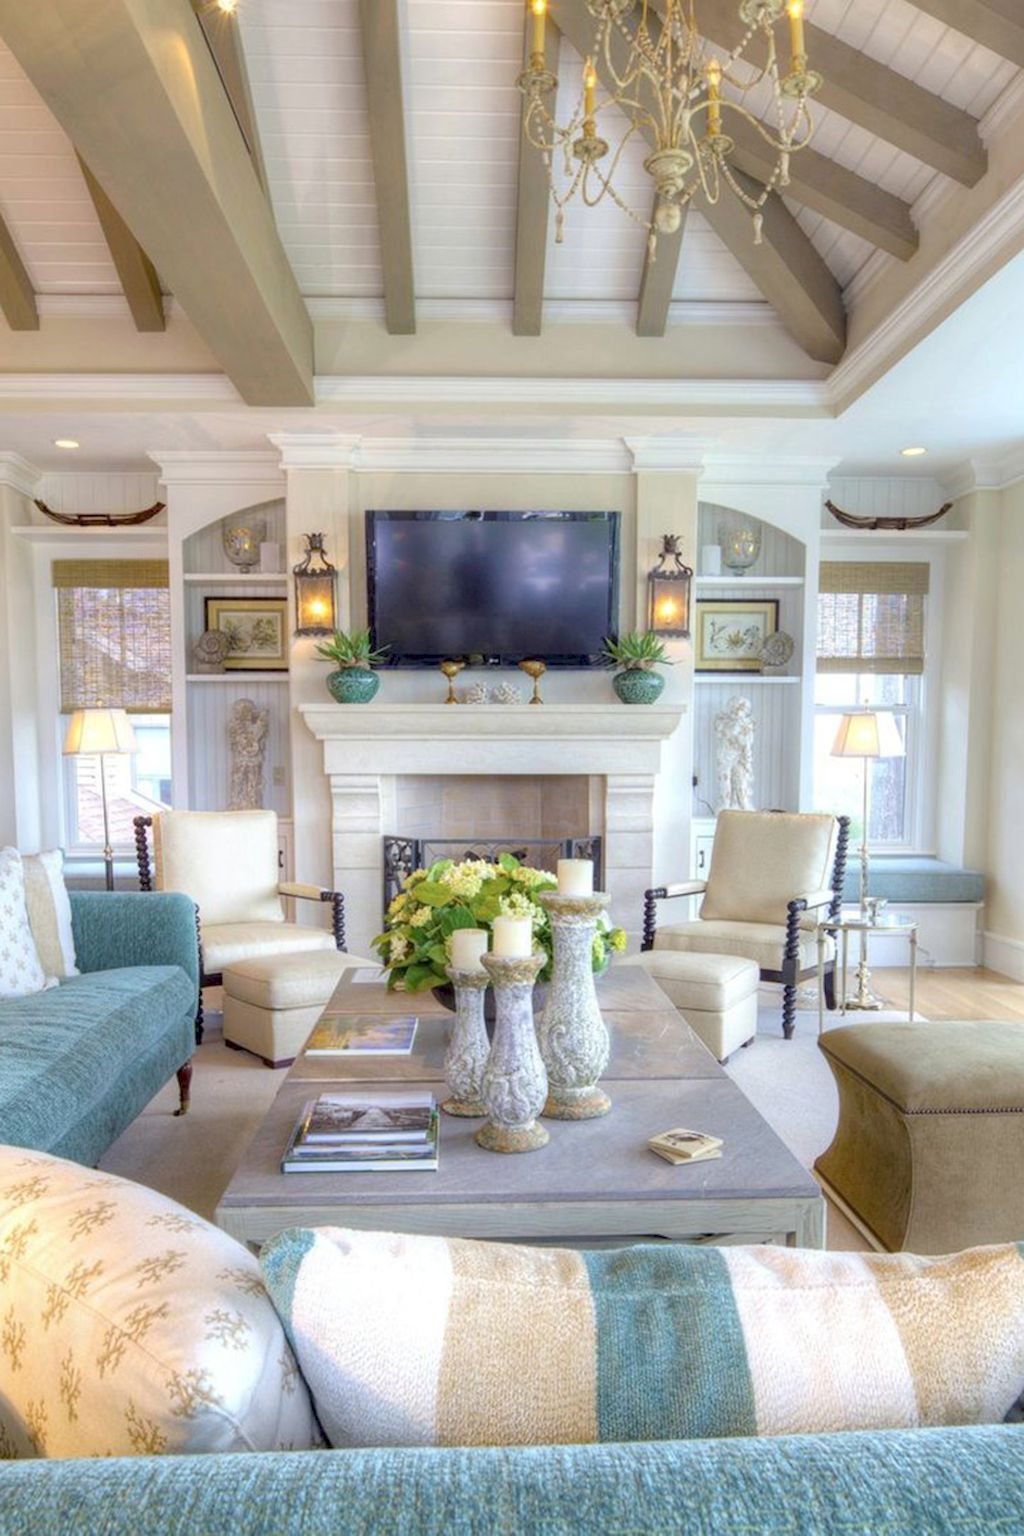 65 Comfy Coastal Living Room Decorating Ideas  Coastal Living Extraordinary Coastal Living Room Designs Decorating Inspiration